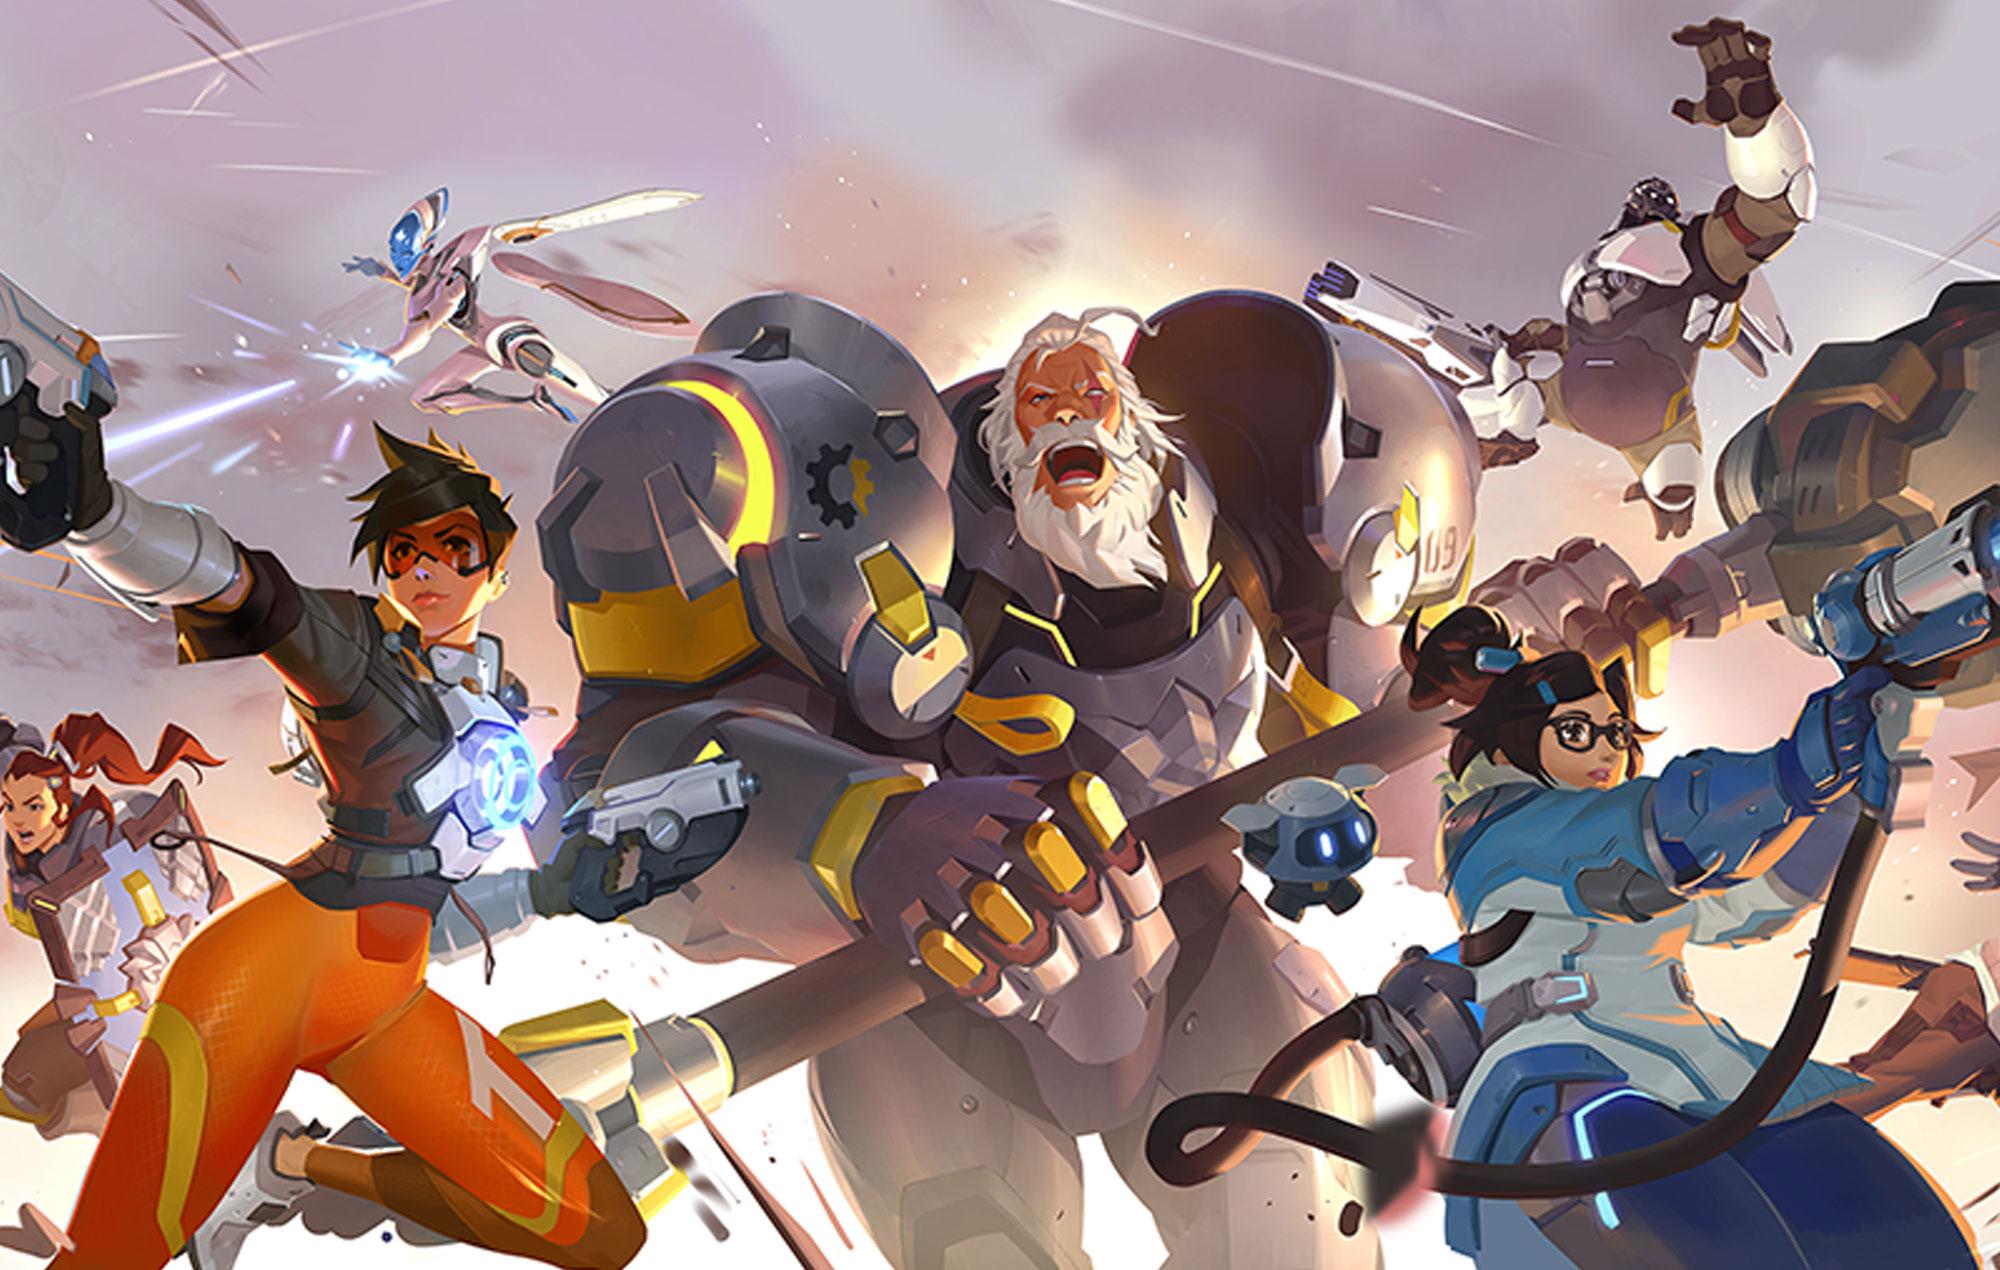 Overwatch artwork